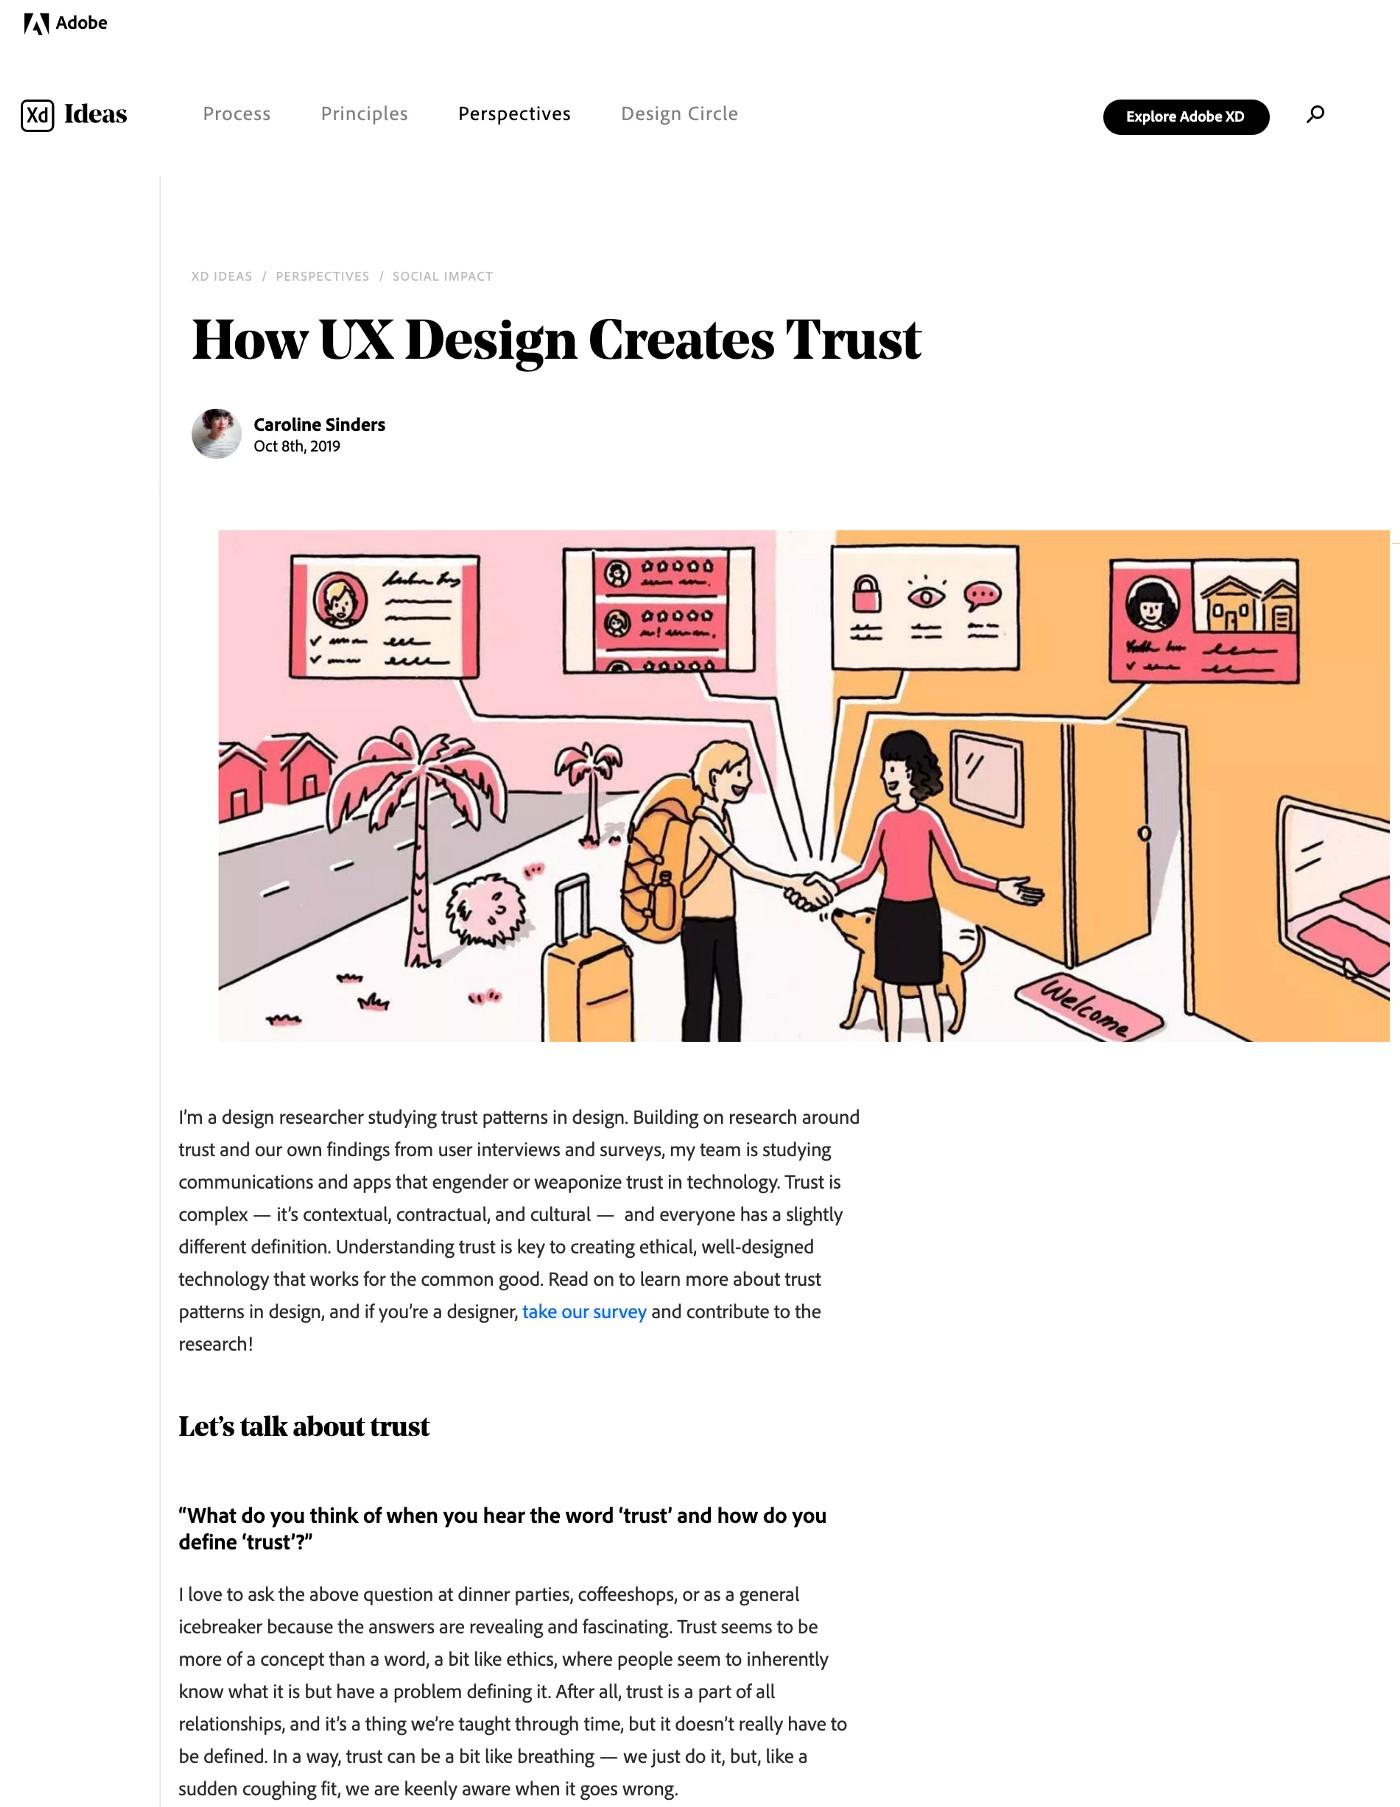 Screenshot of Adobe blog article titled 'How UX Design Creates Trust' written by Caroline Sinders